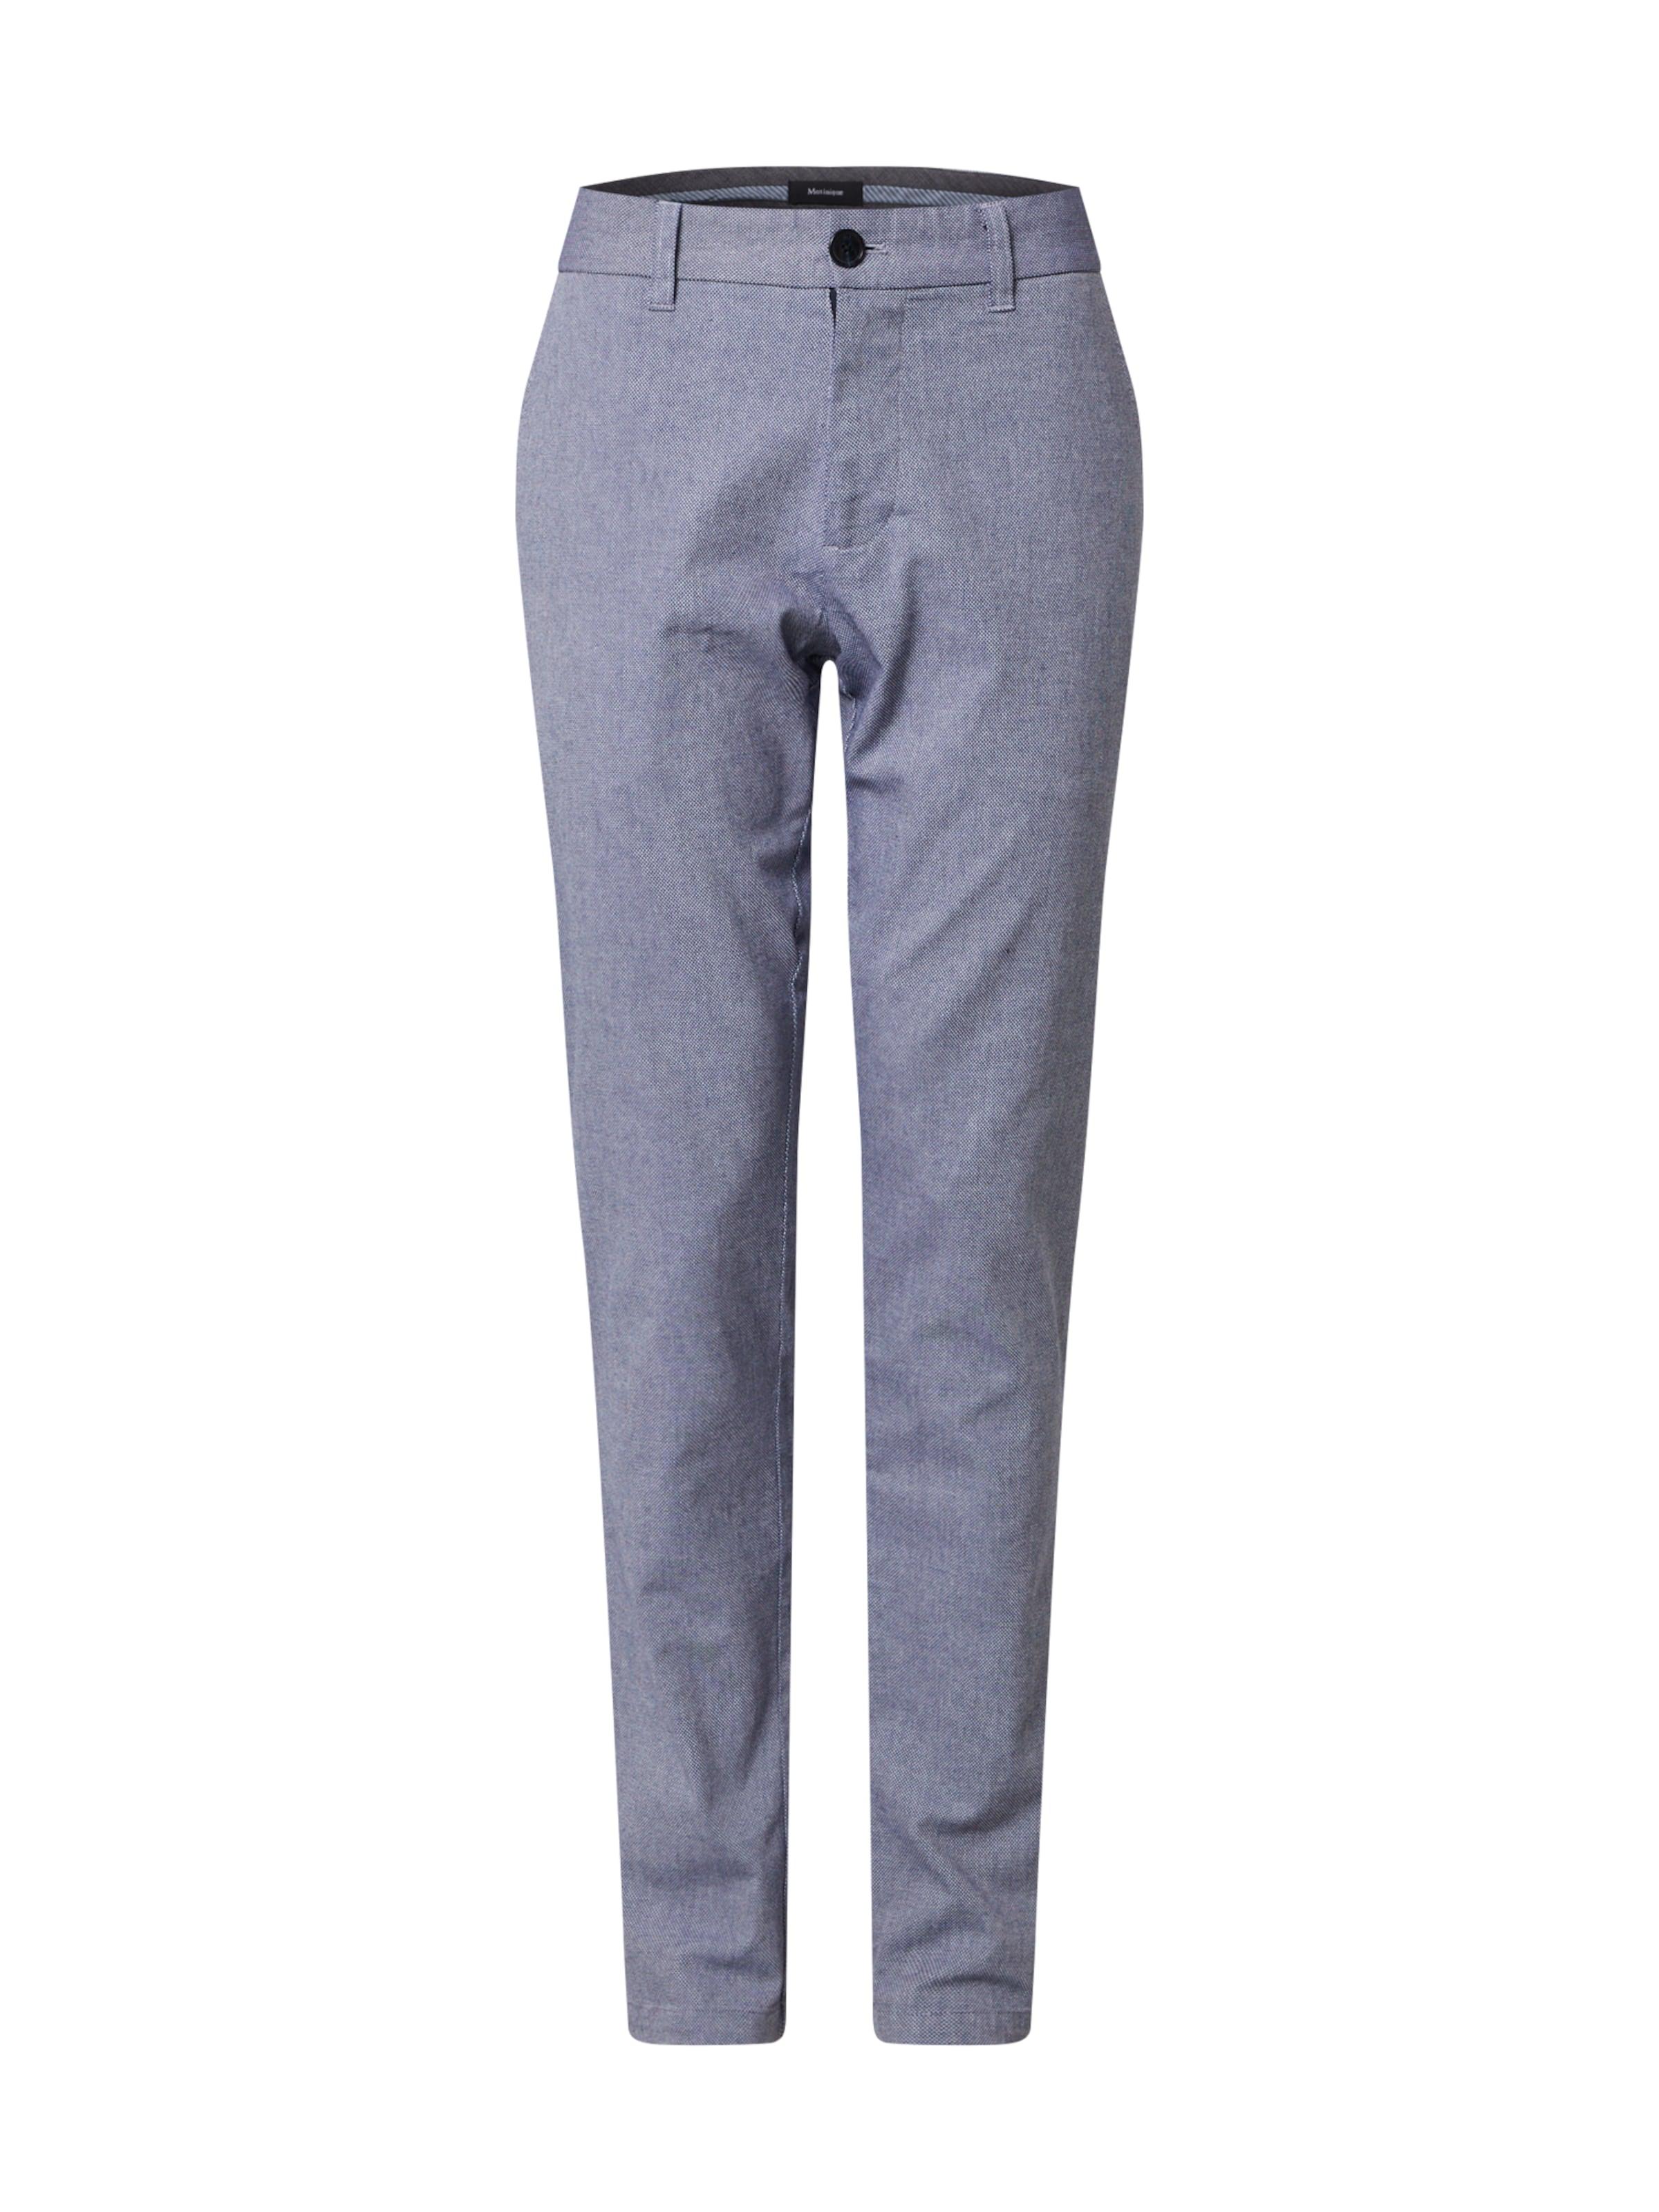 Matinique Pantalon chino en bleu marine IC8o7h